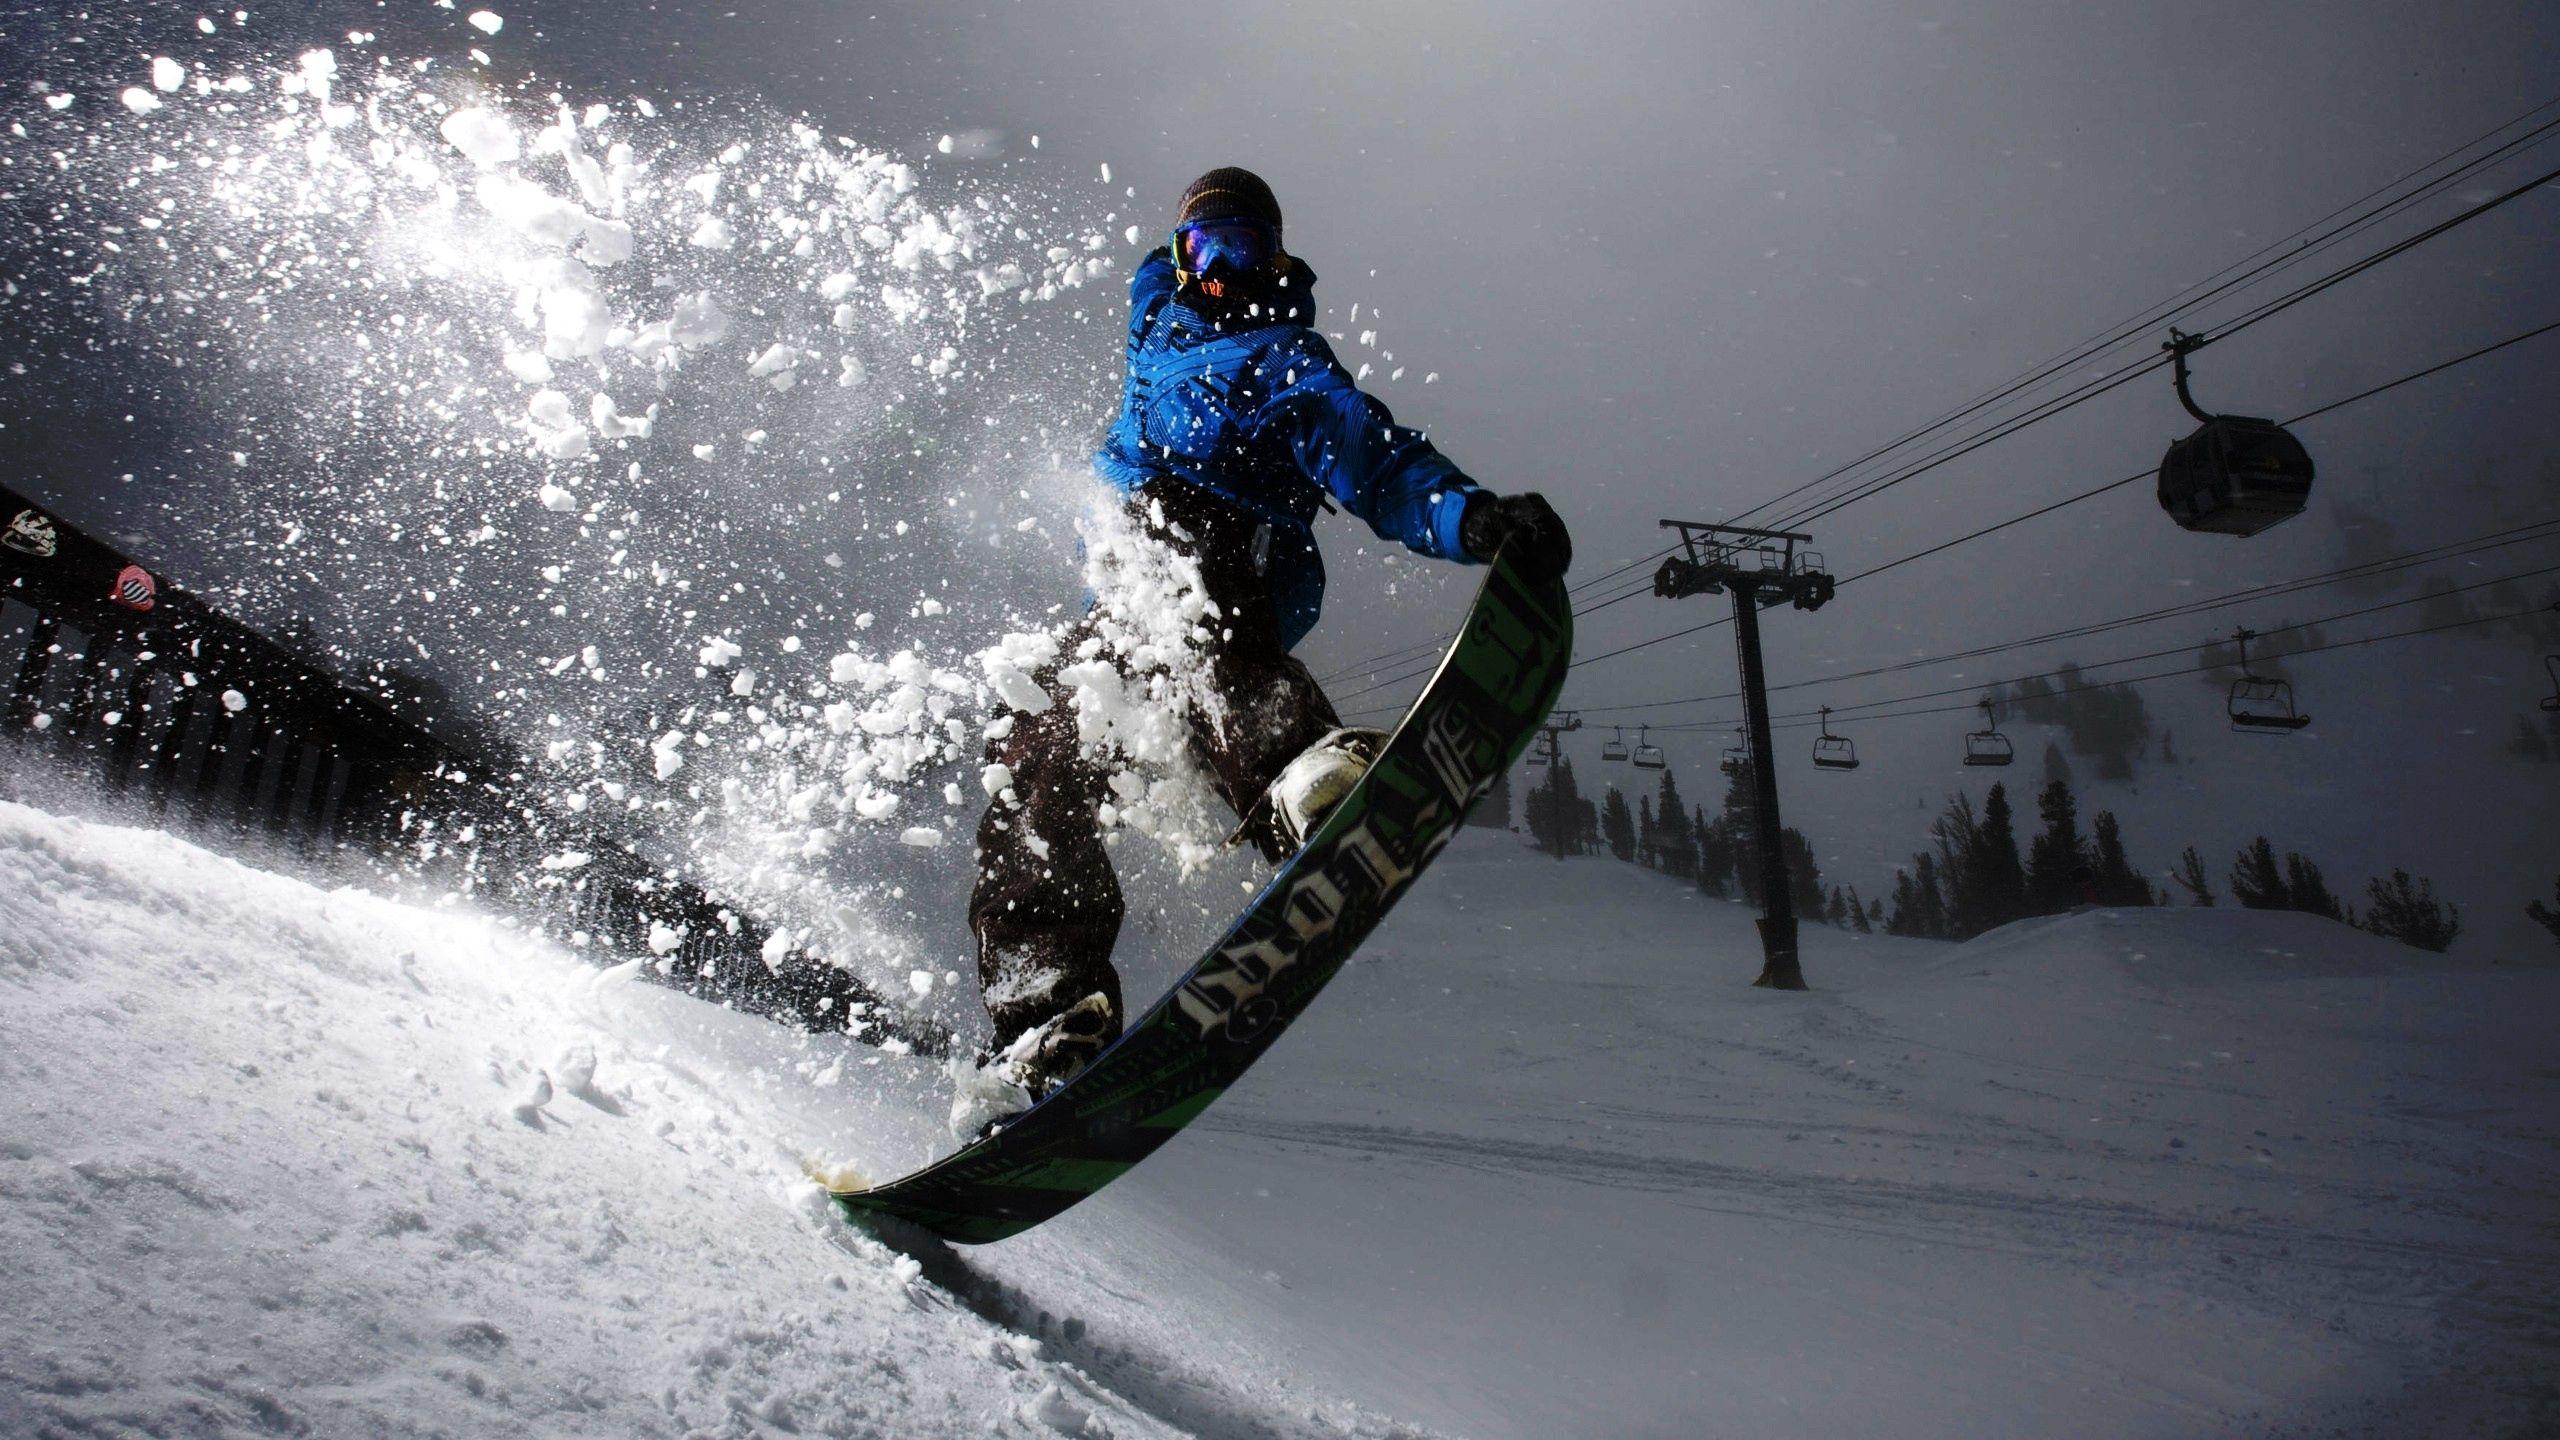 97805 Заставки и Обои Спорт на телефон. Скачать Спорт, Снег, Свет, Вечер, Сноуборд, Трюк картинки бесплатно